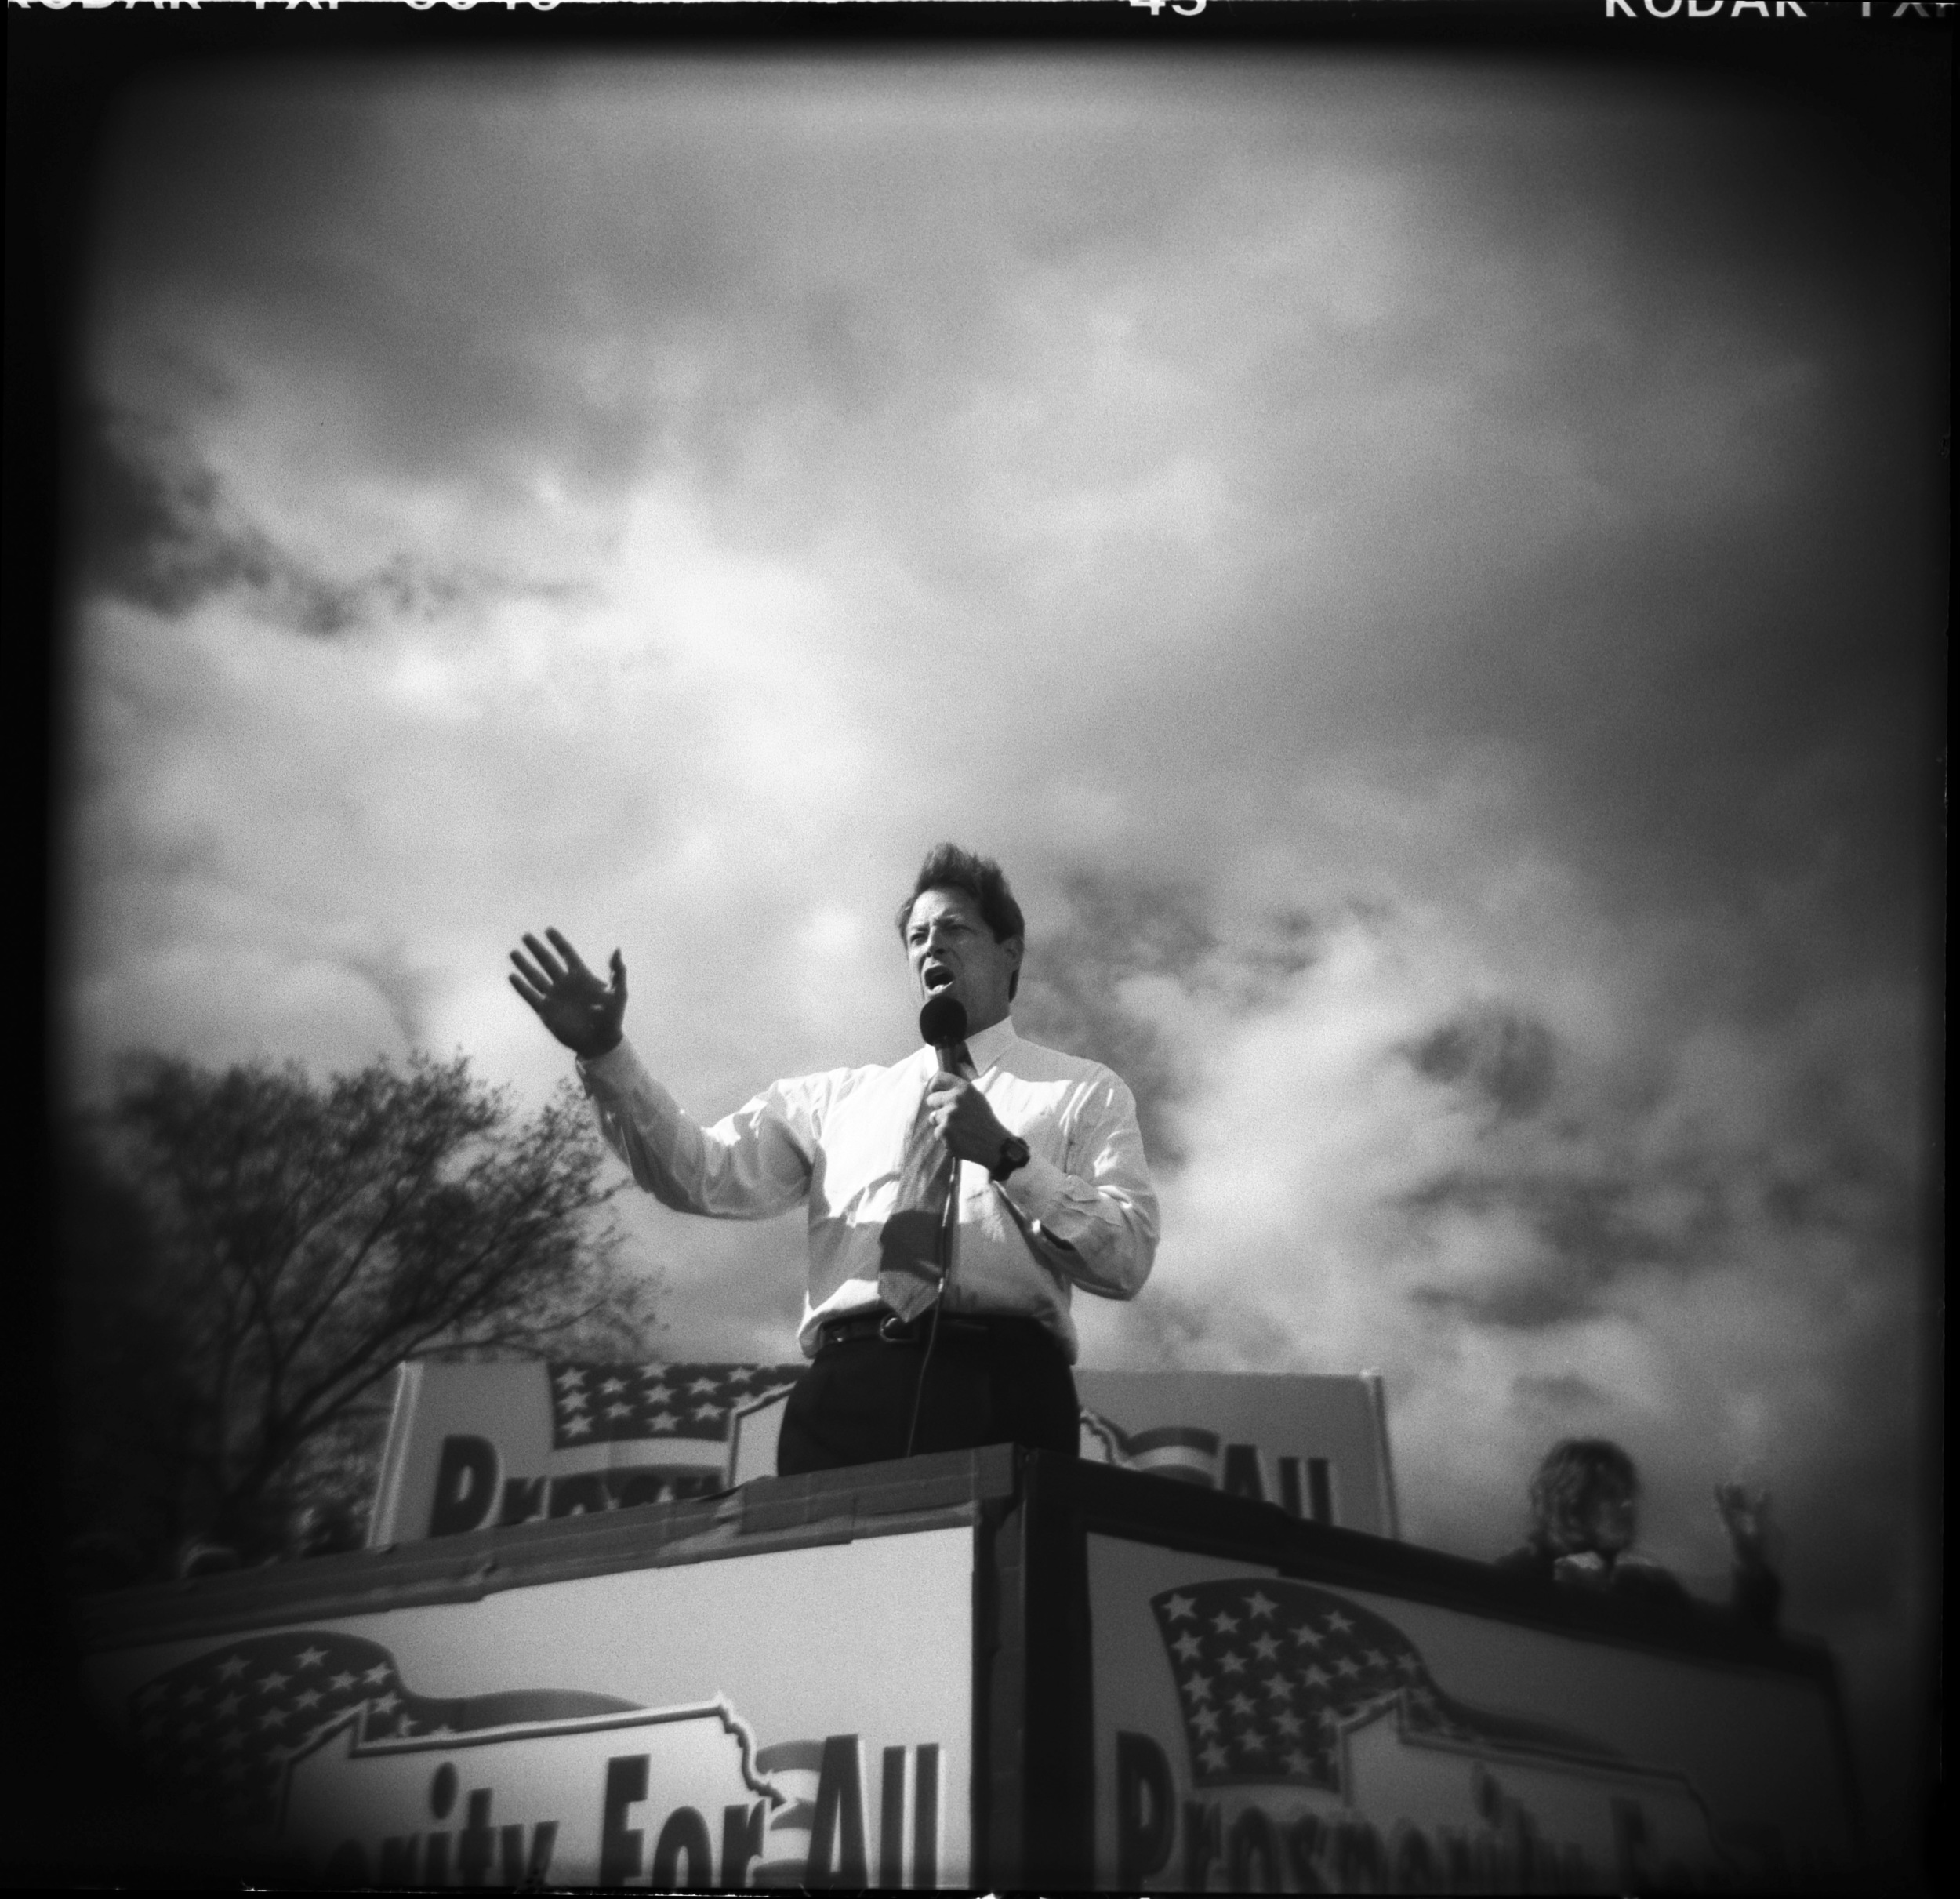 Vice-President Al Gore during the last days of his unsuccessful presidential campaign against George W. Bush,Philadelphia, Pennsylvania, November 2000. © 2015 David Burnett/Contact Press Images